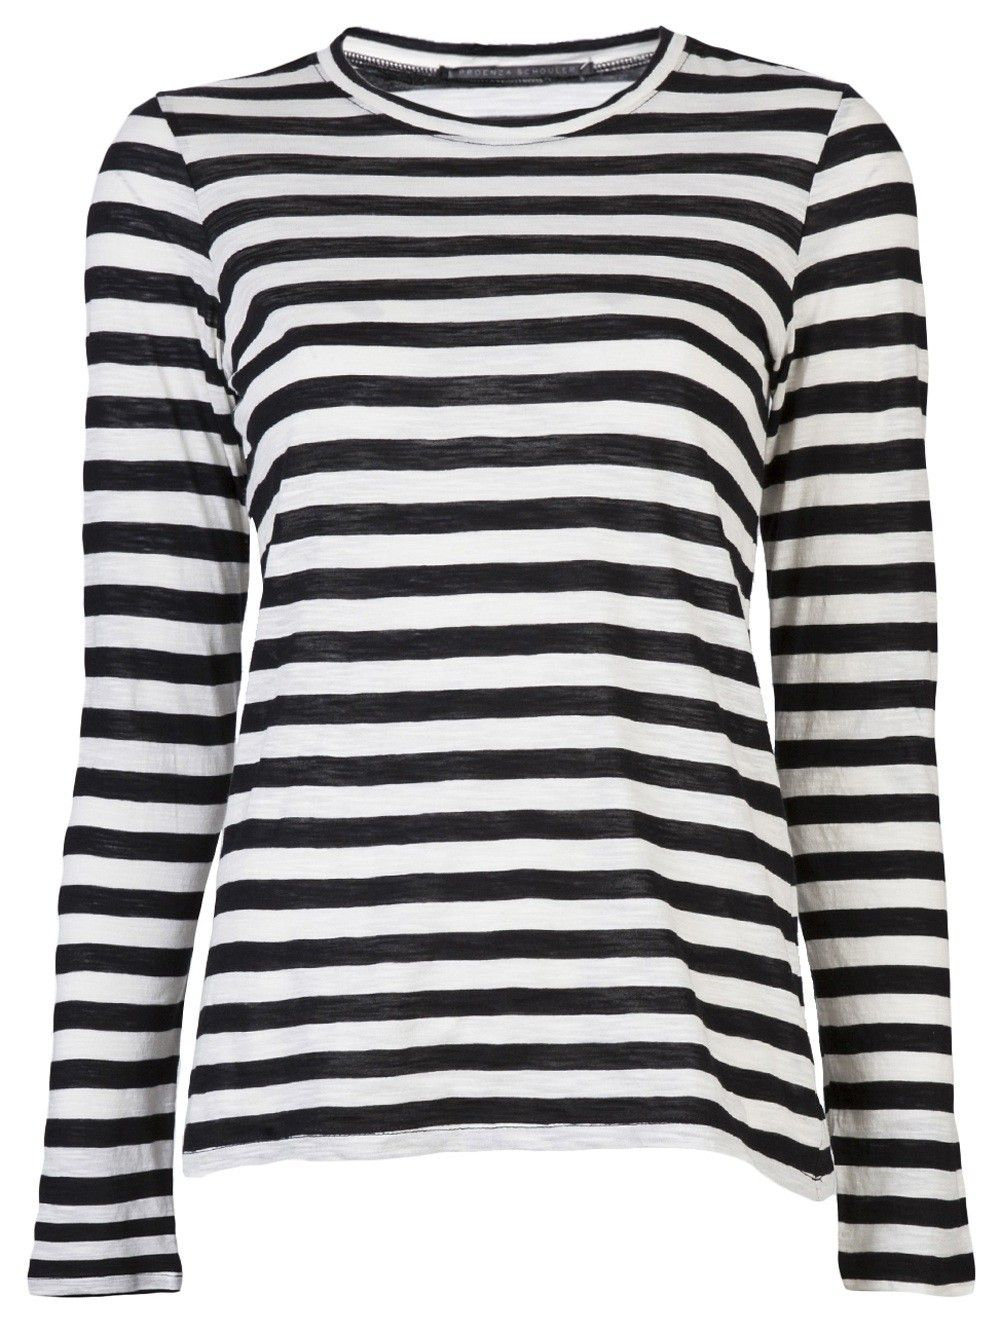 Proenza Schouler Long Sleeve Striped T-shirt http://roanshop.com ...